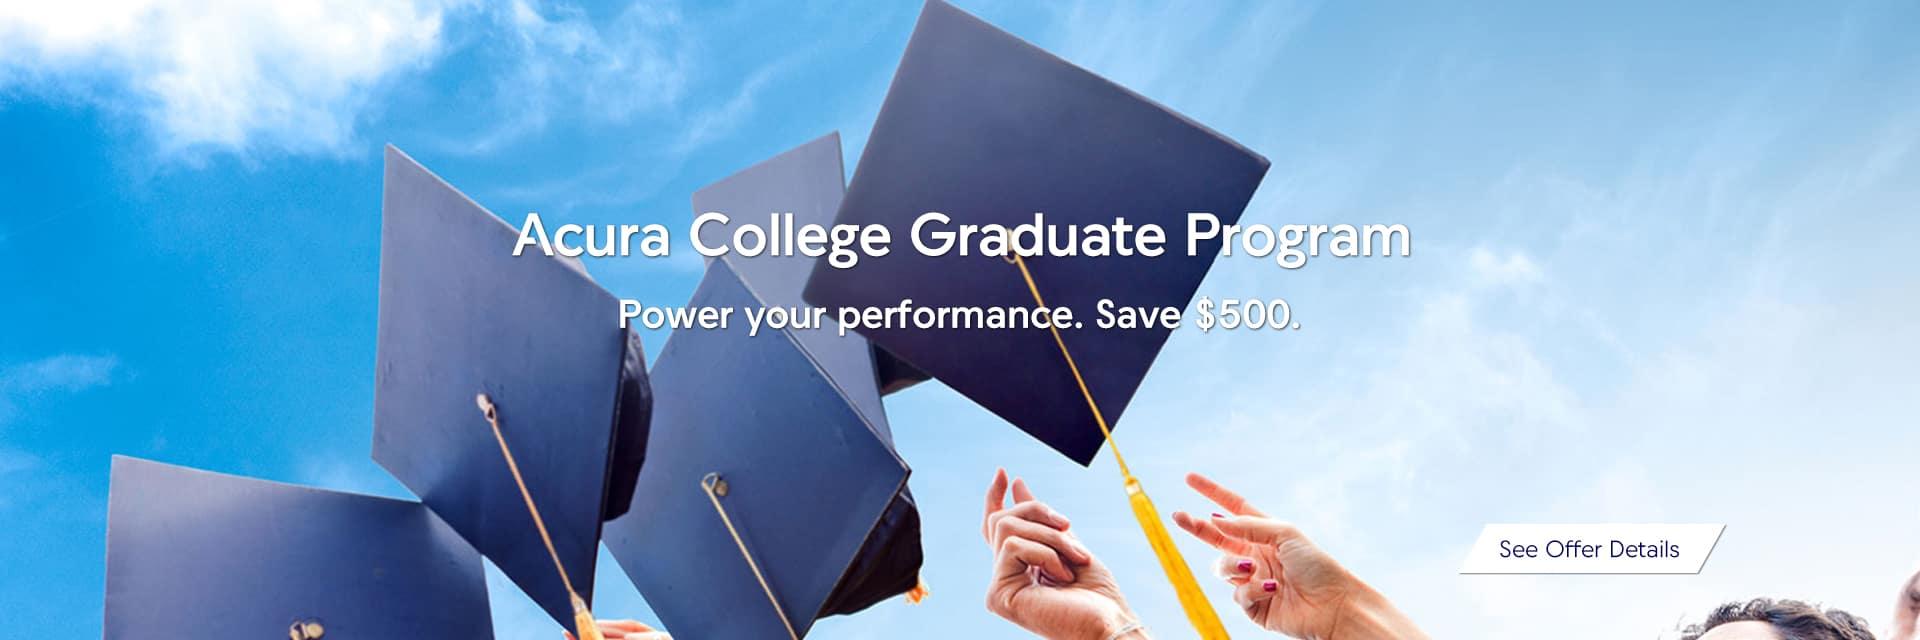 Acura College Graduate Program Sunnyside Acura Nashua, NH 03063